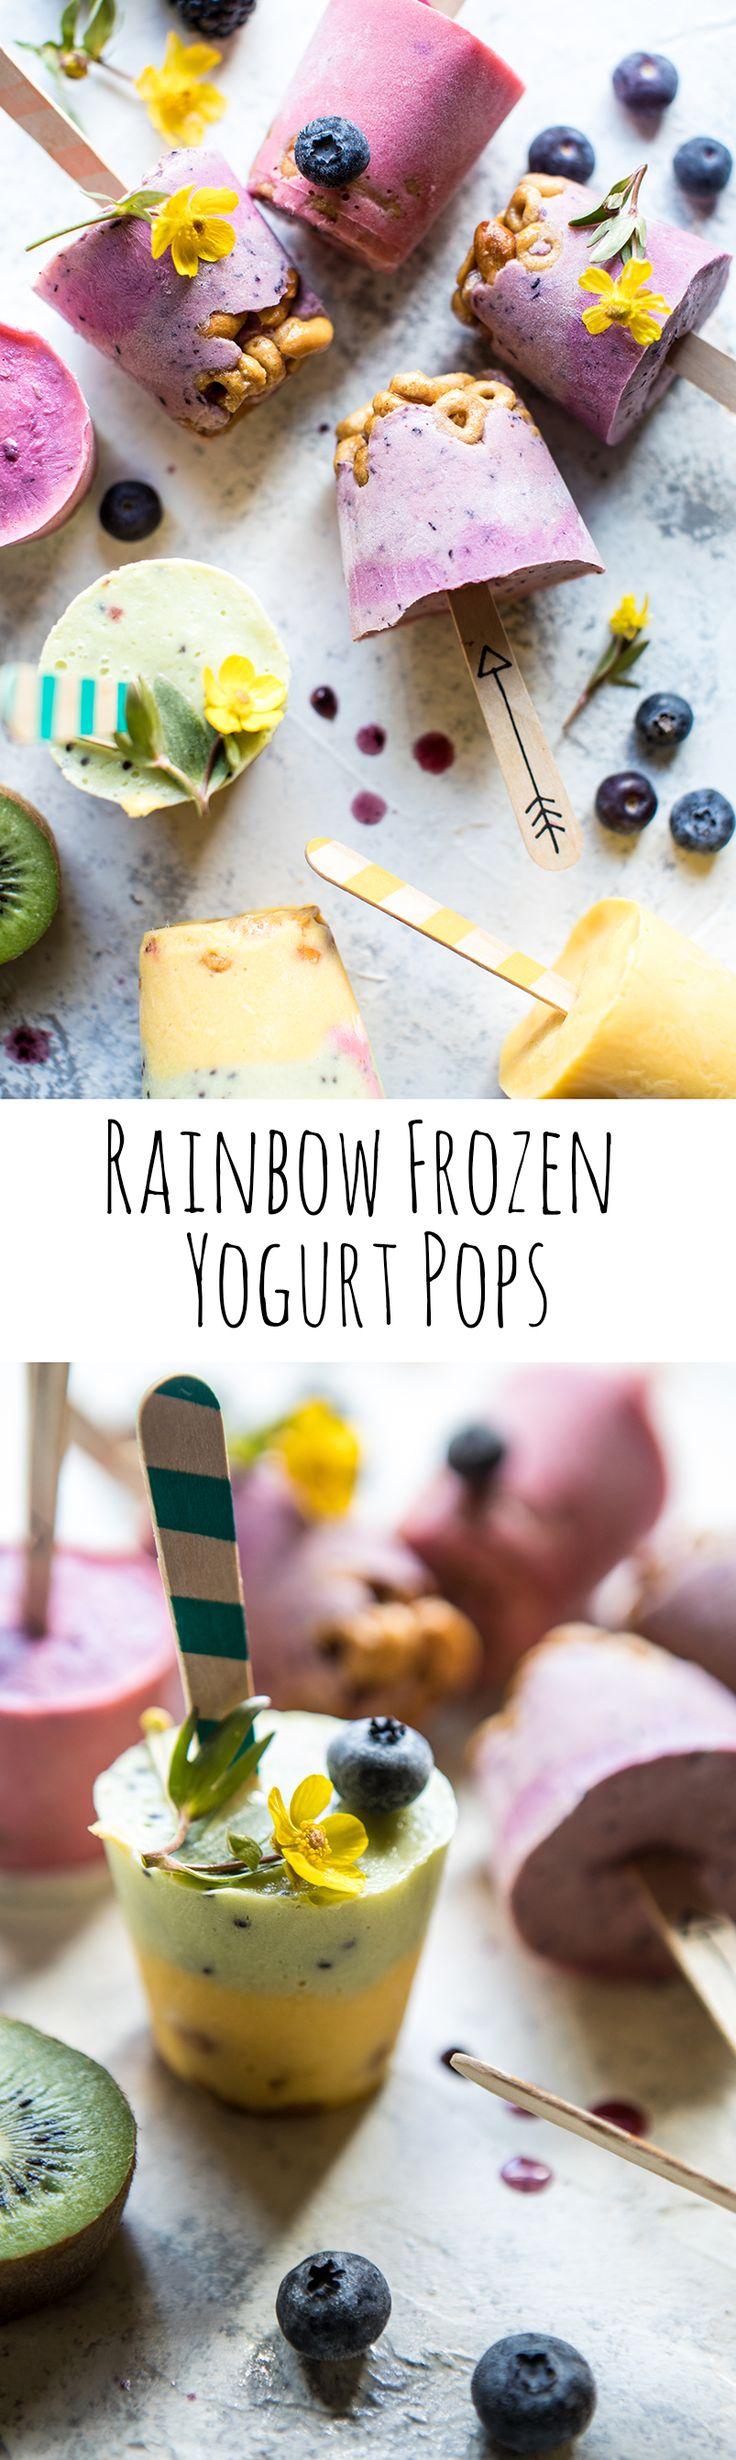 Rainbow Frozen Yogurt Pops   halfbakedharvest.com @hbharvest